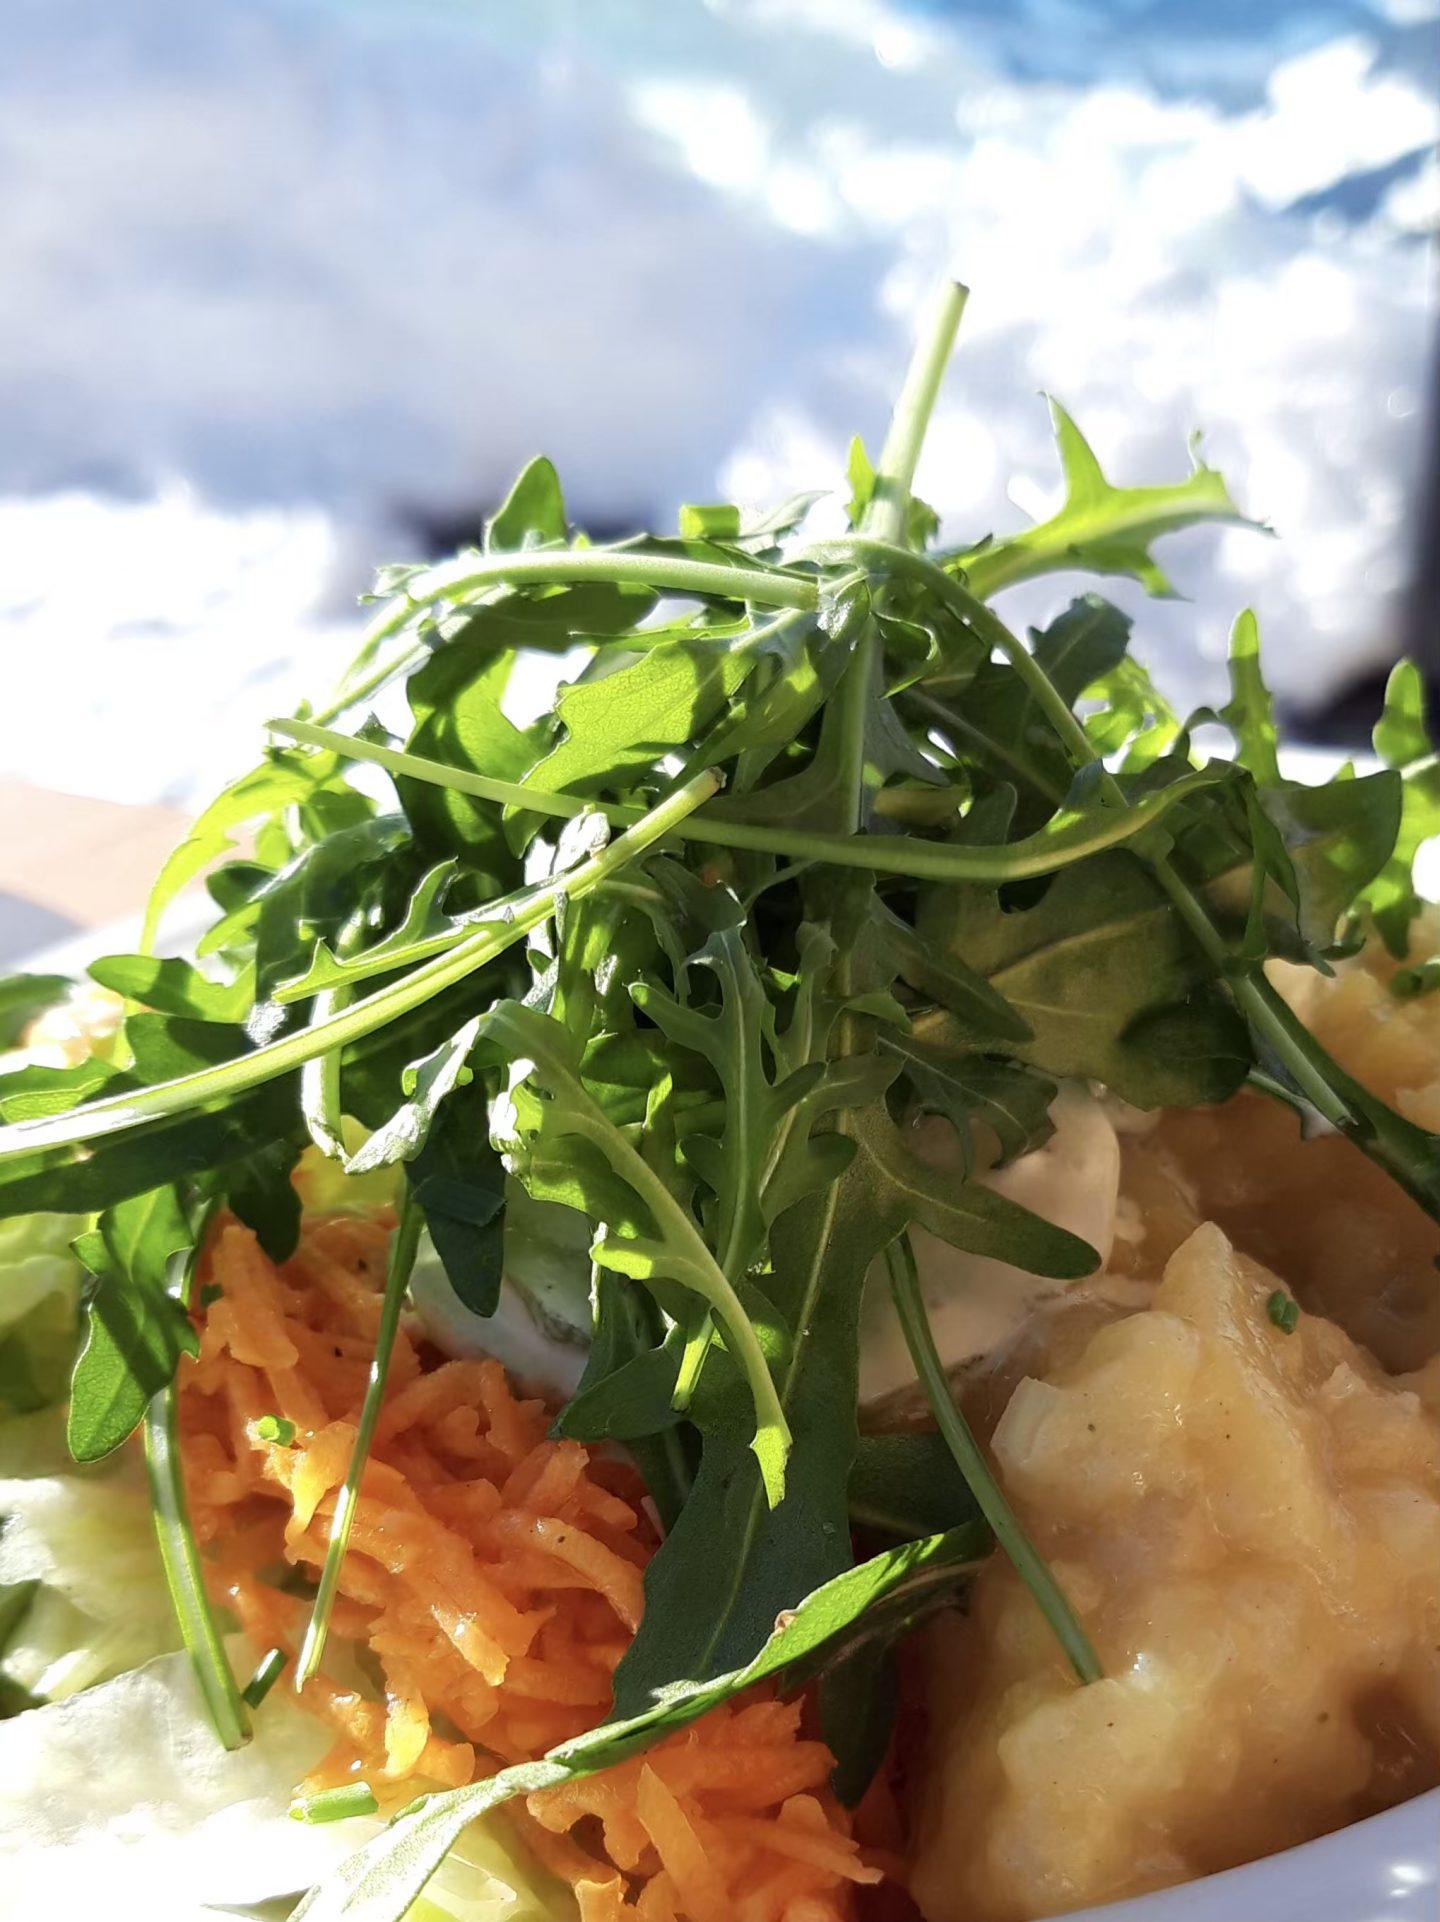 Neulich am Salatäquator